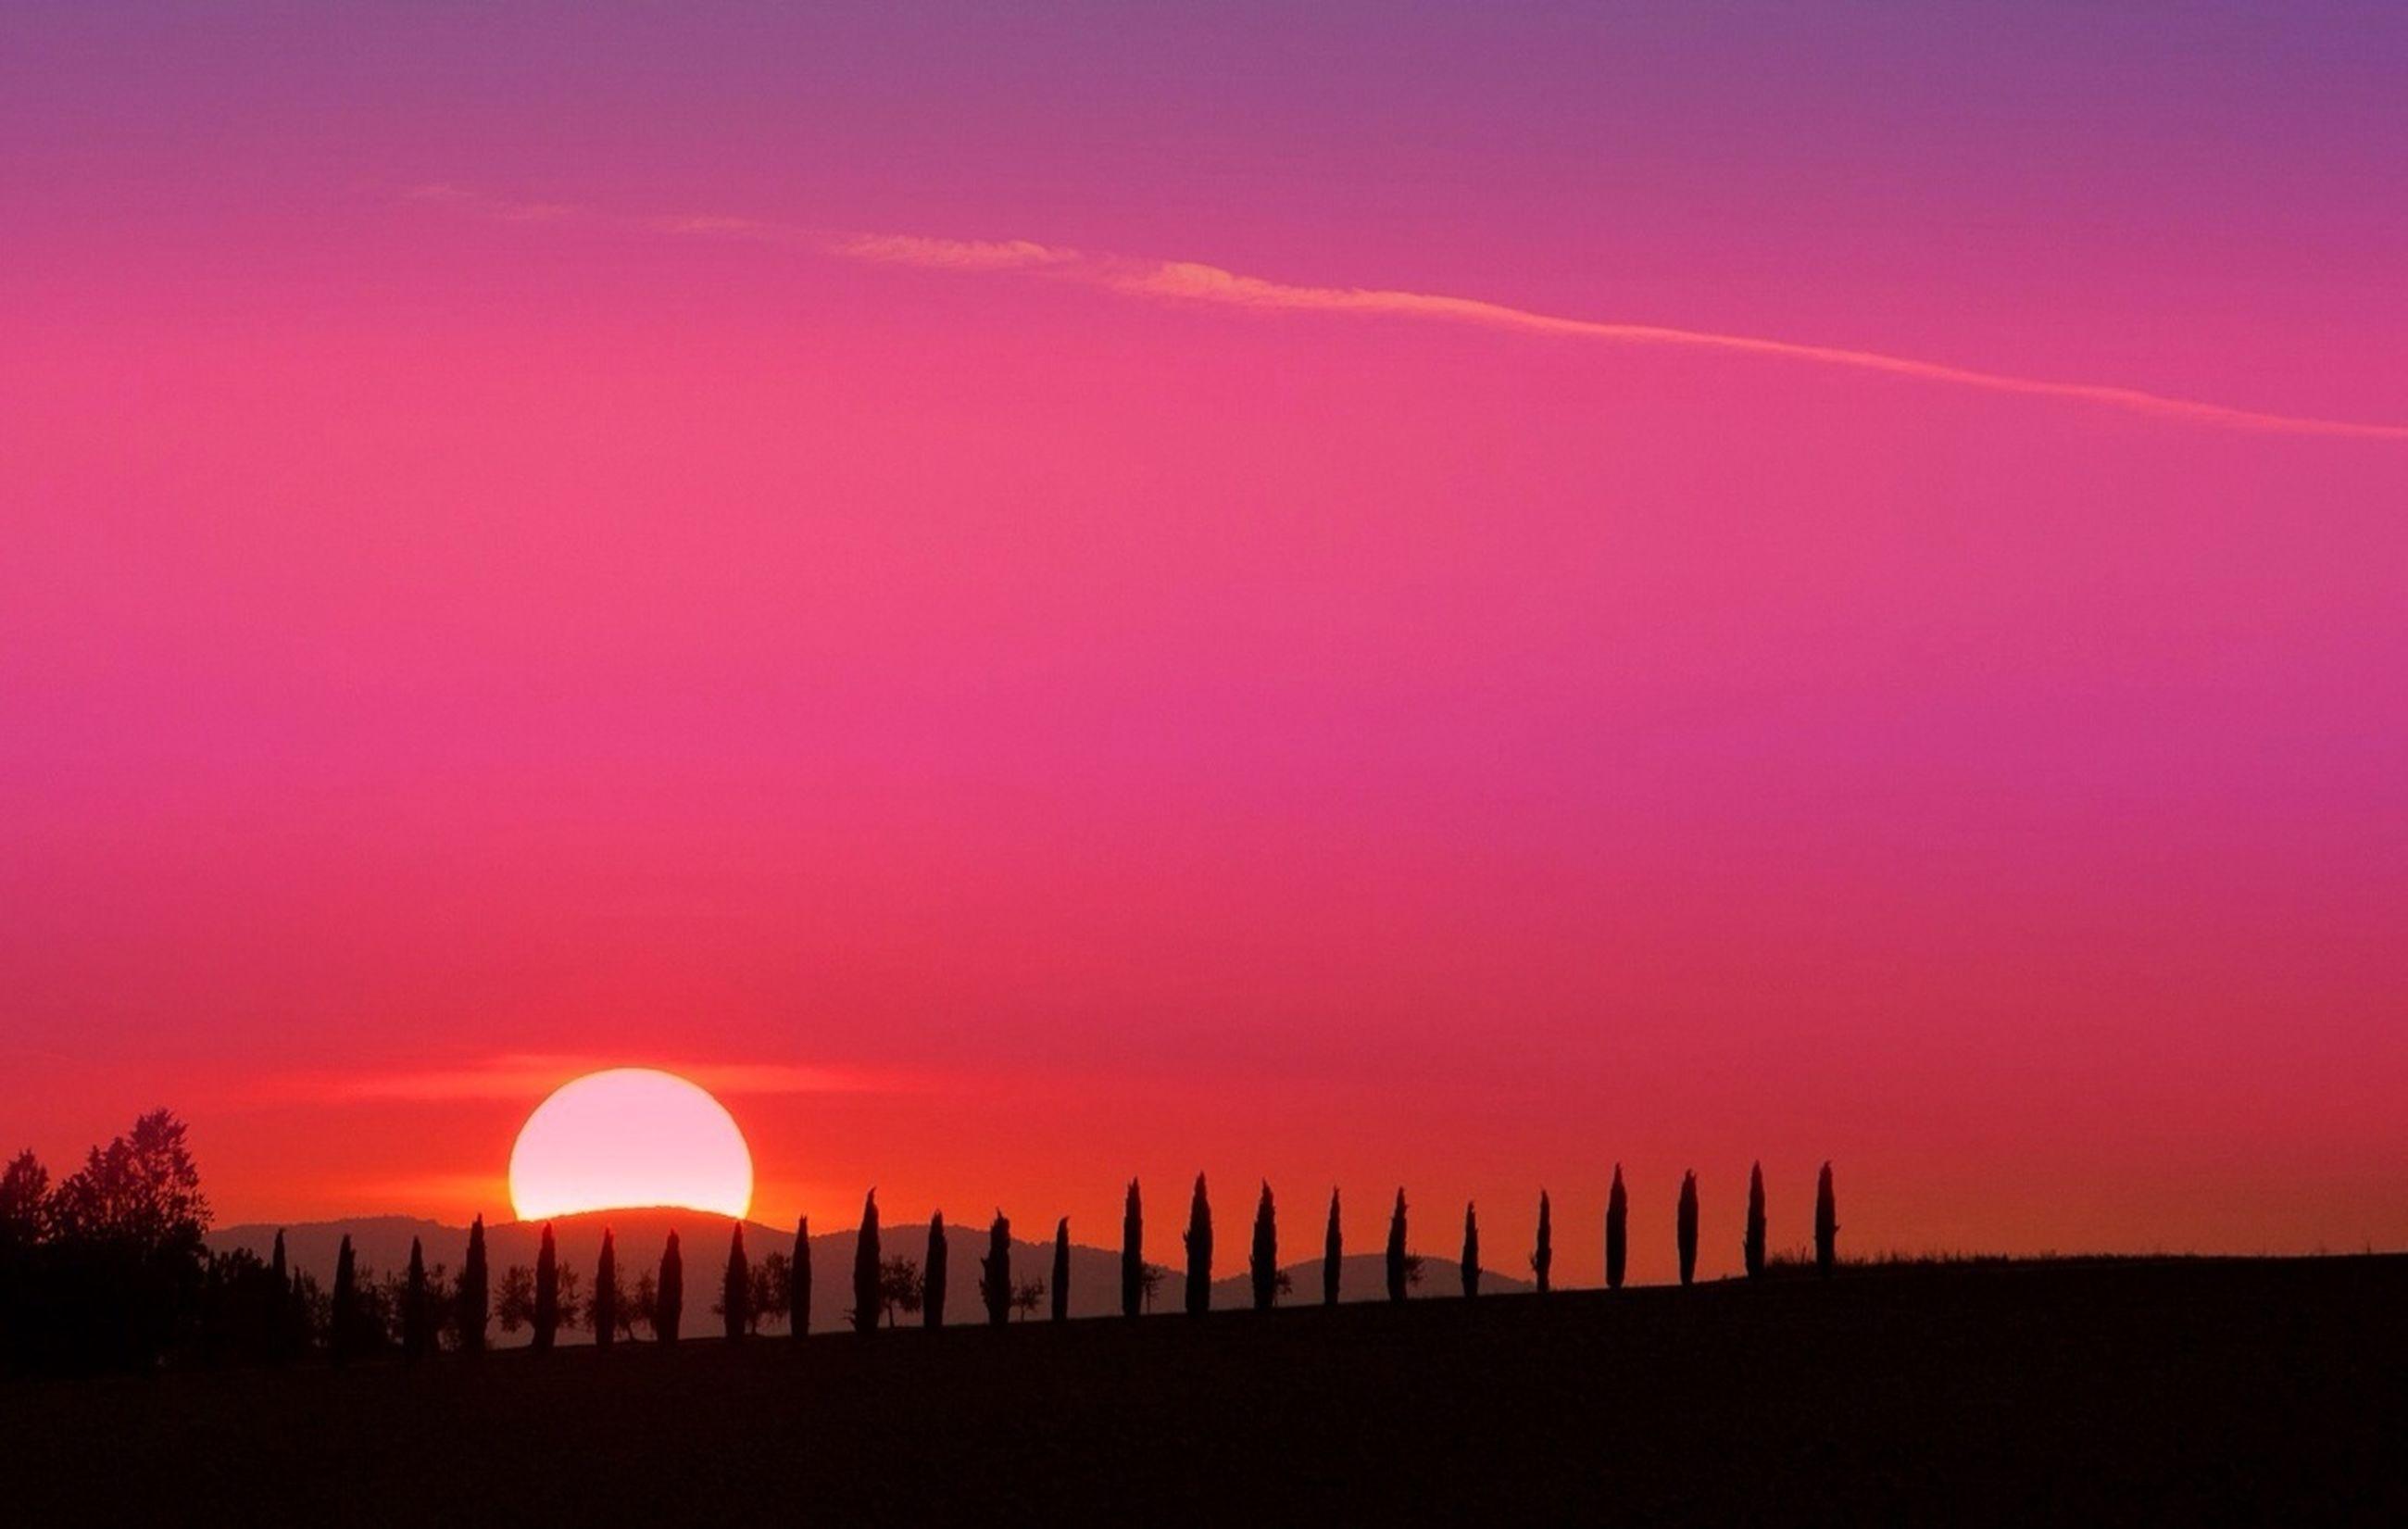 sunset, silhouette, tranquil scene, scenics, tranquility, beauty in nature, orange color, sun, horizon over water, sky, idyllic, nature, sea, landscape, beach, copy space, outdoors, remote, non-urban scene, sunlight